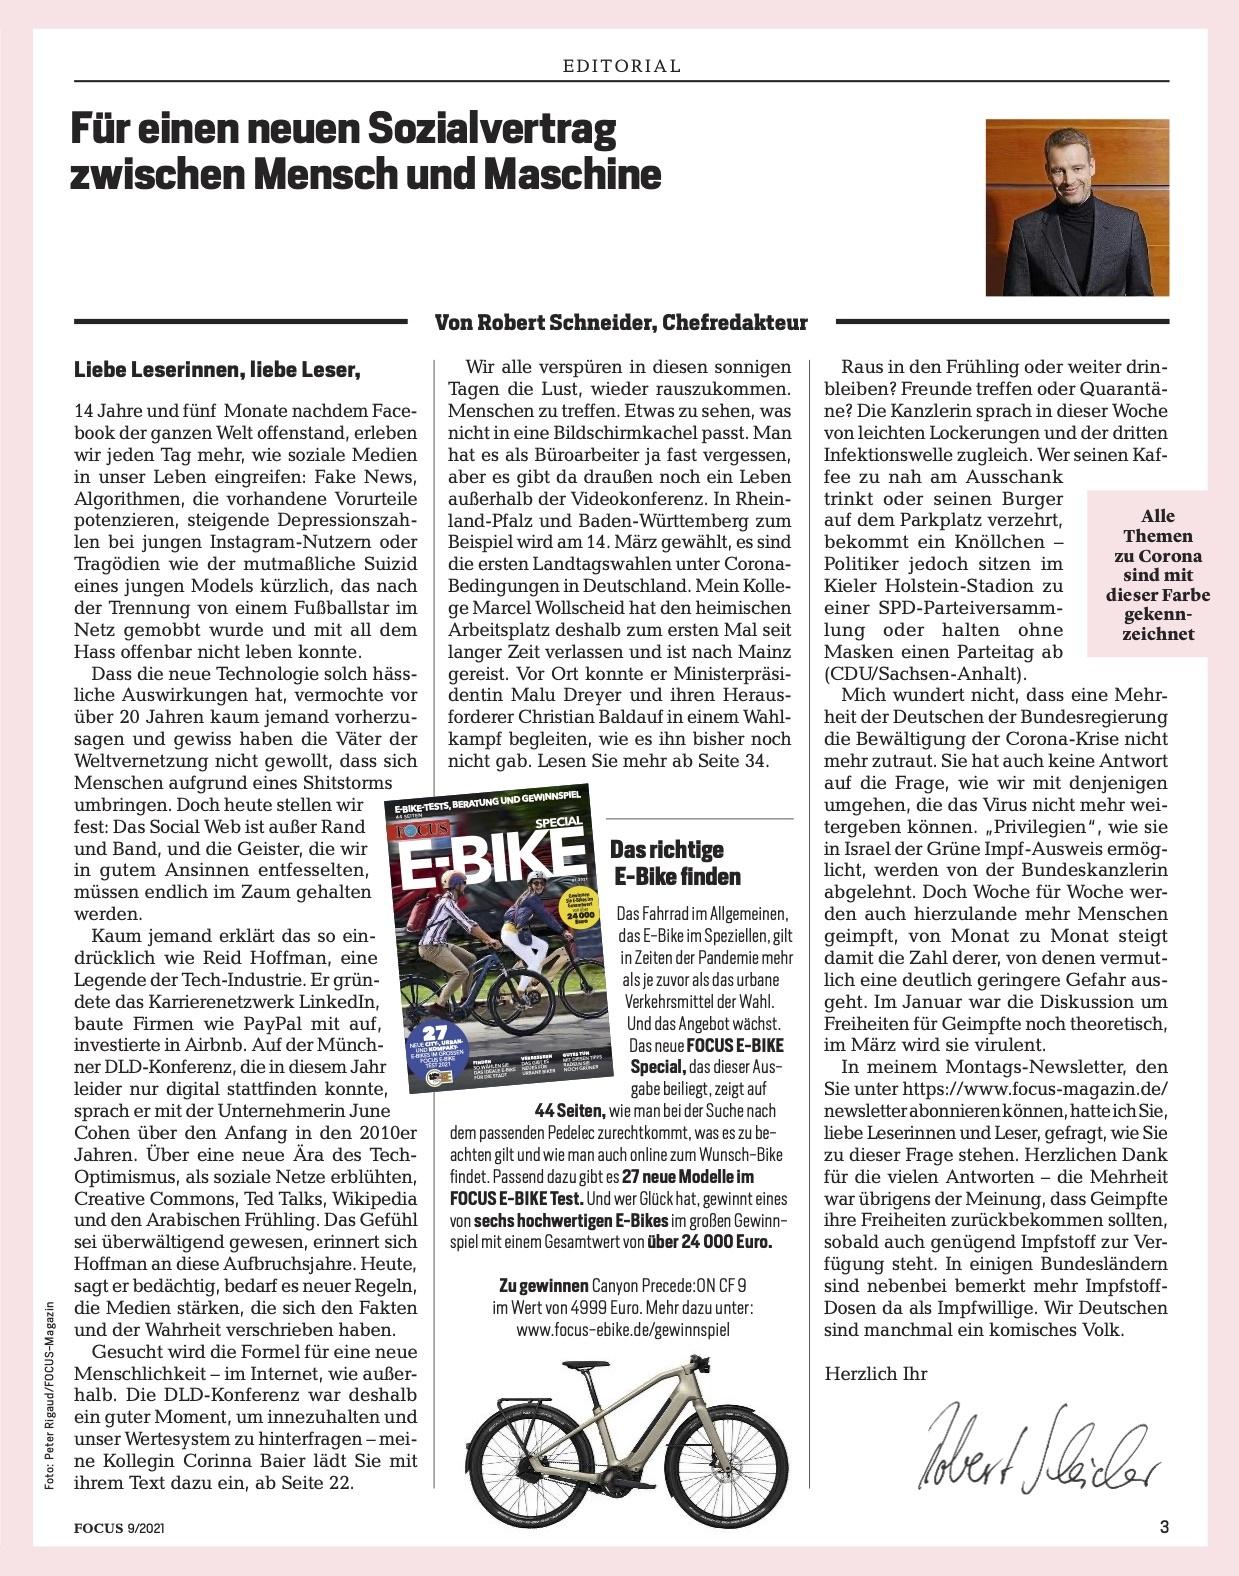 FOCUS Magazin FOCUS Magazin - Der digitale Goldrausch